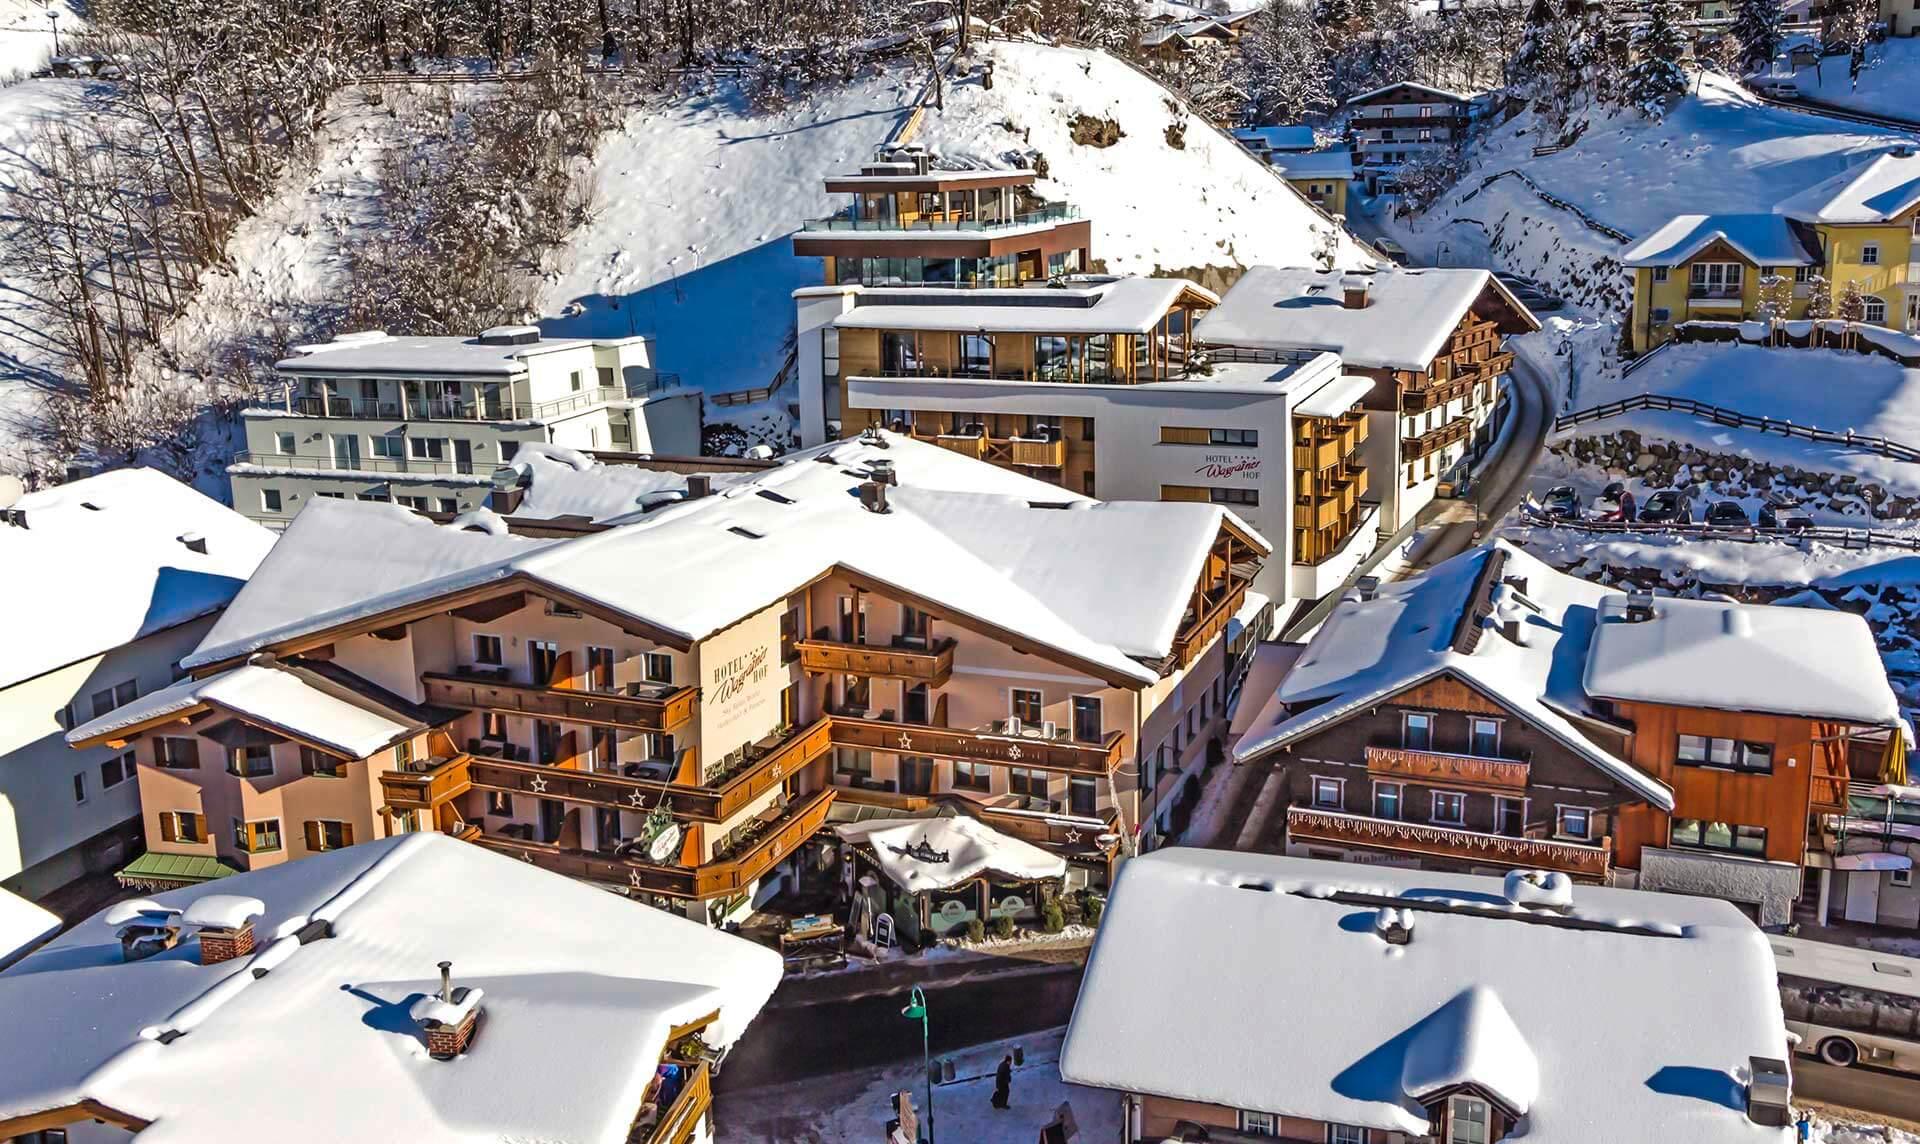 Skihotel in Wagrain, Ski amadé - Hotel Wagrainerhof